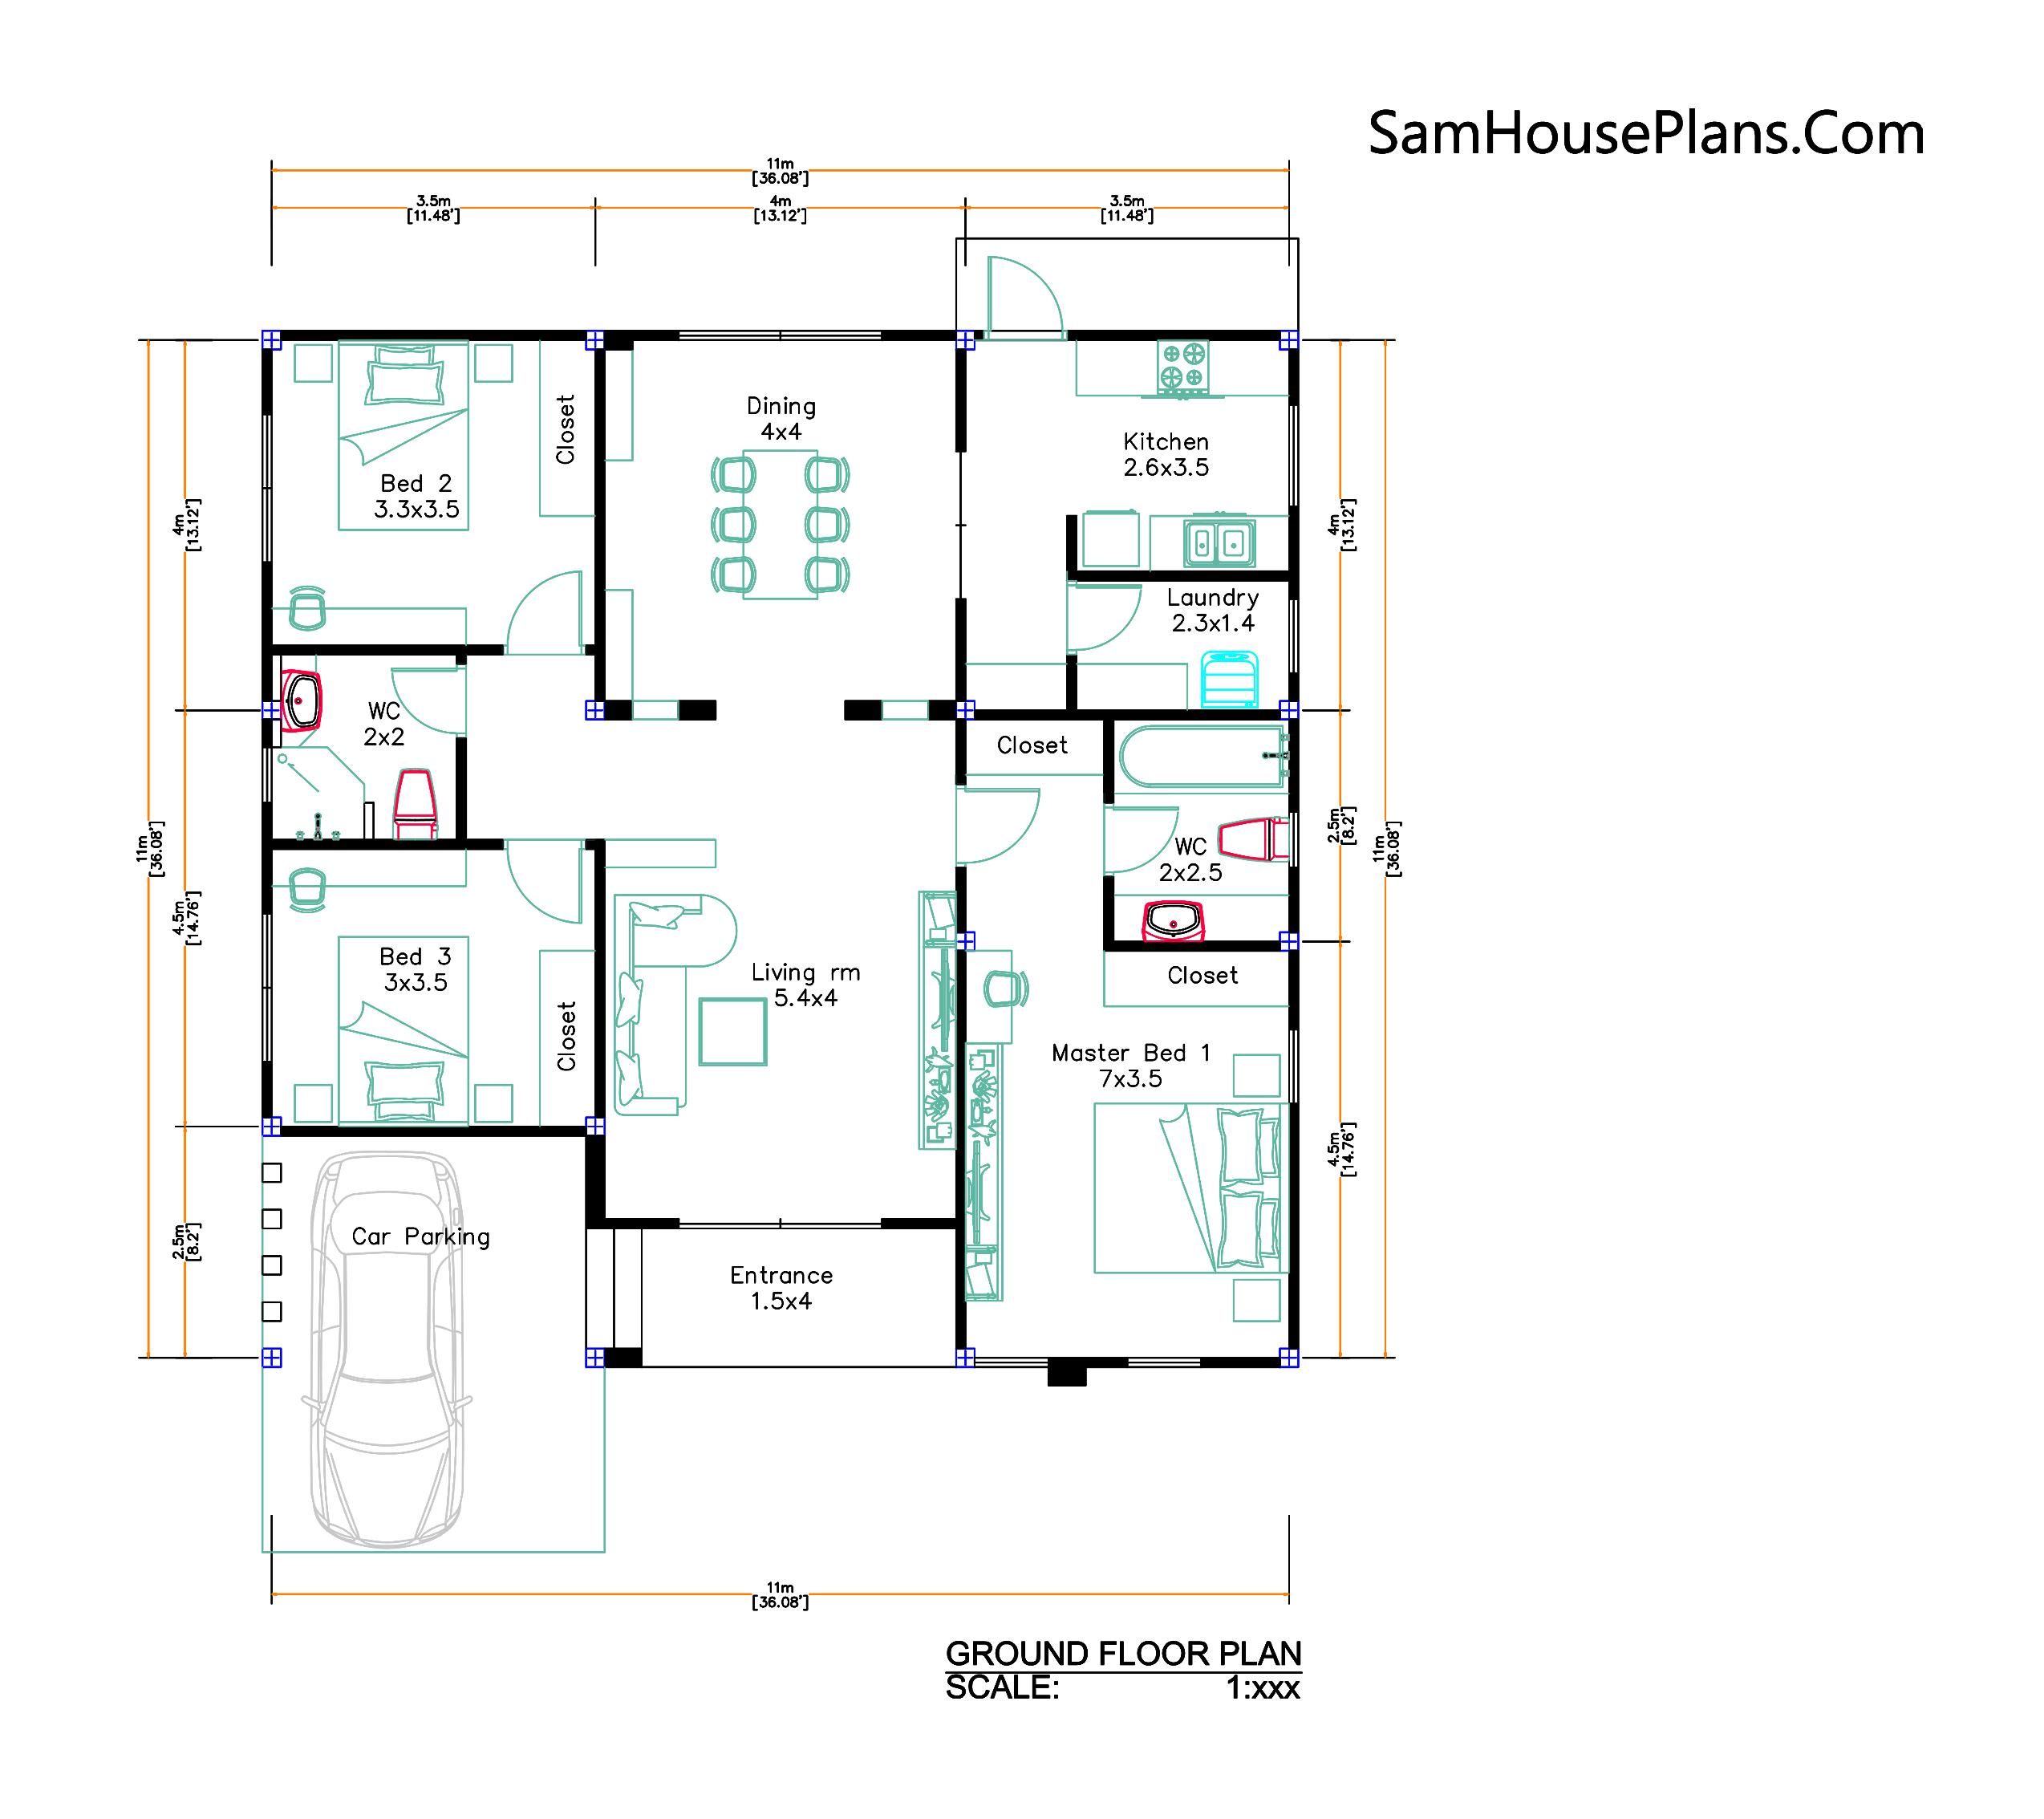 House Design Plans 11x11 meter 3 Bedrooms PDF Plans floor plan